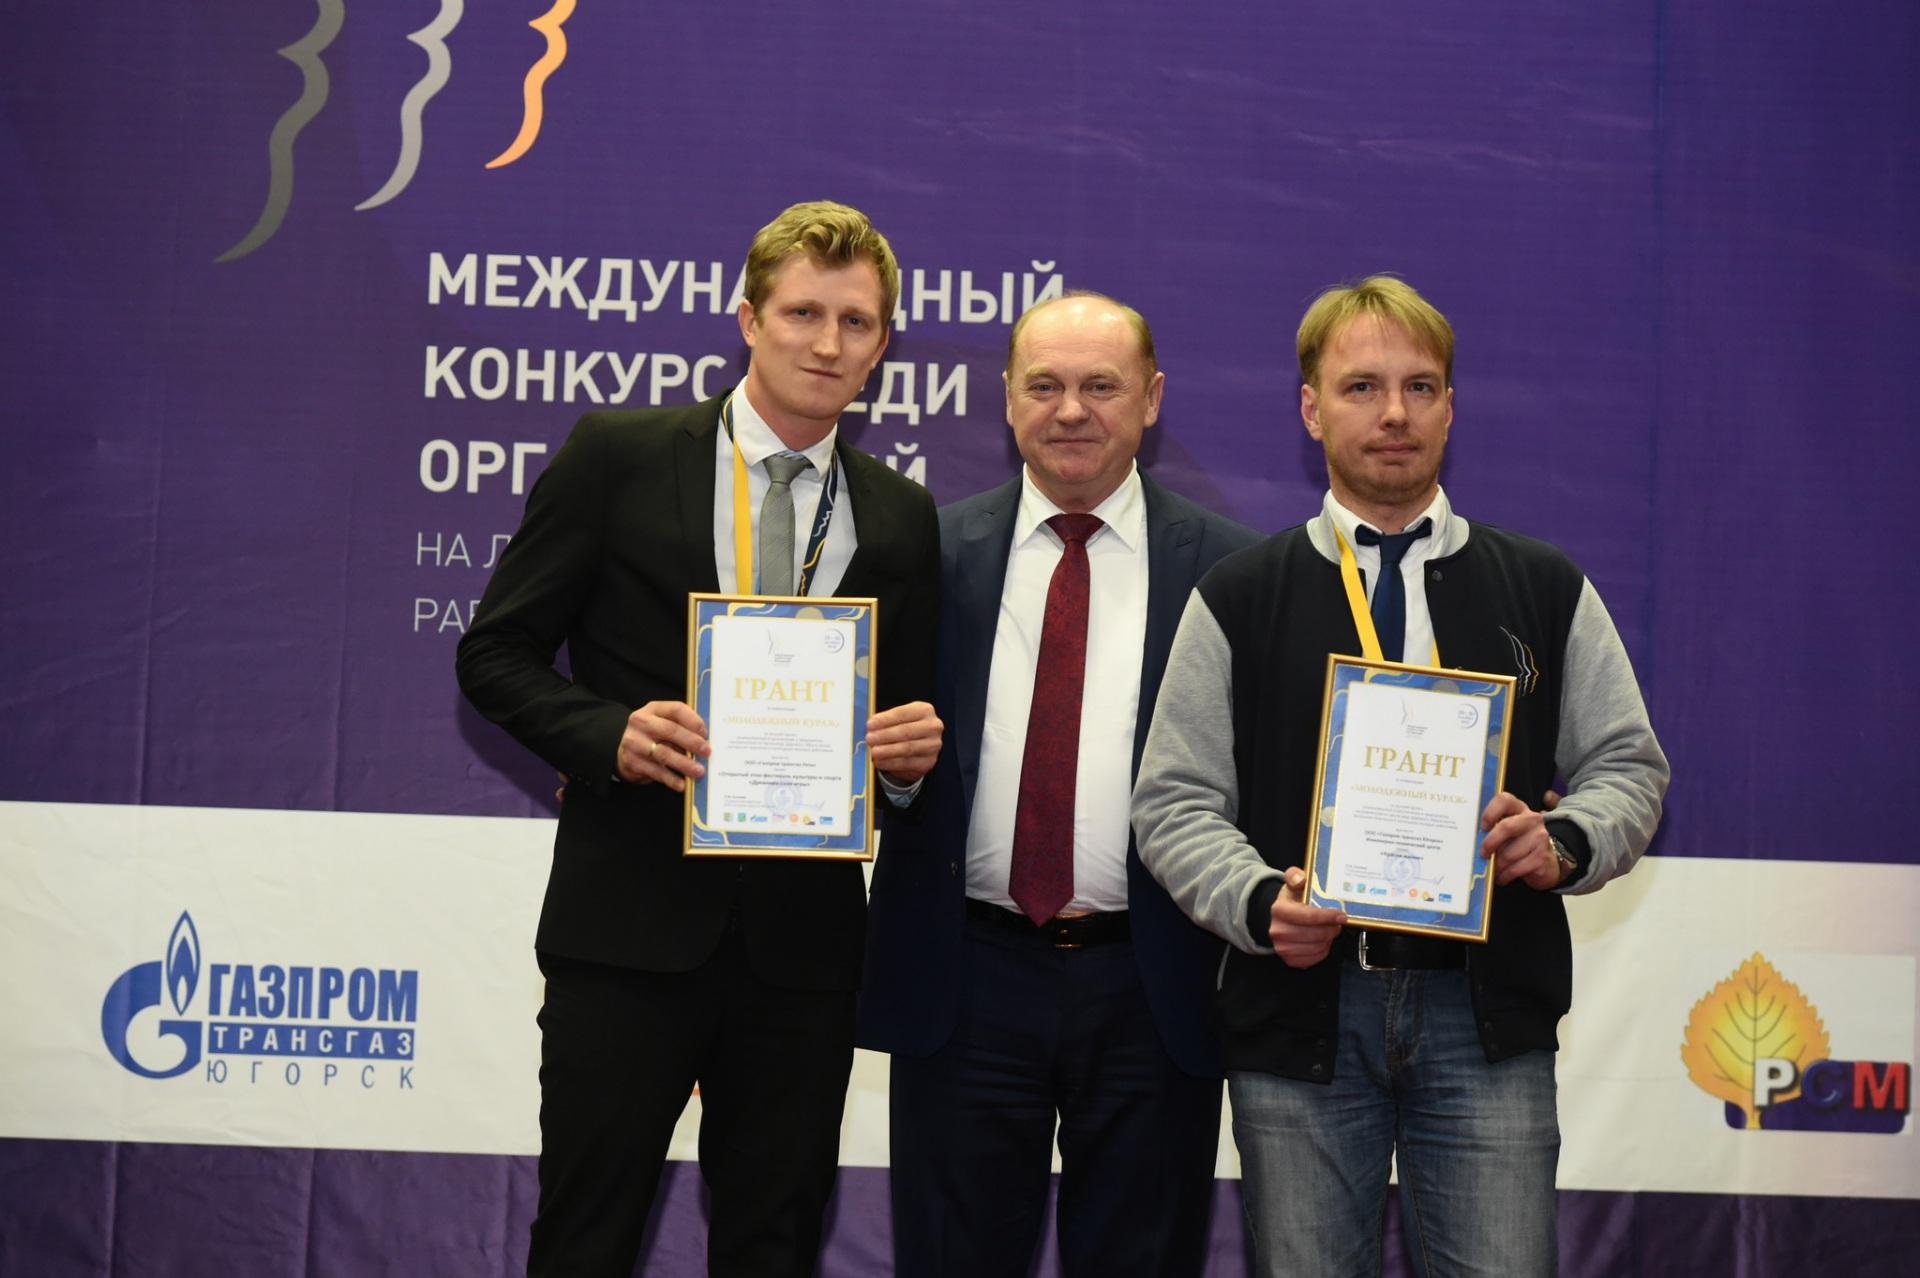 2018.10.30-Konkurs-MKSOP-Yugorsk-4.jpg